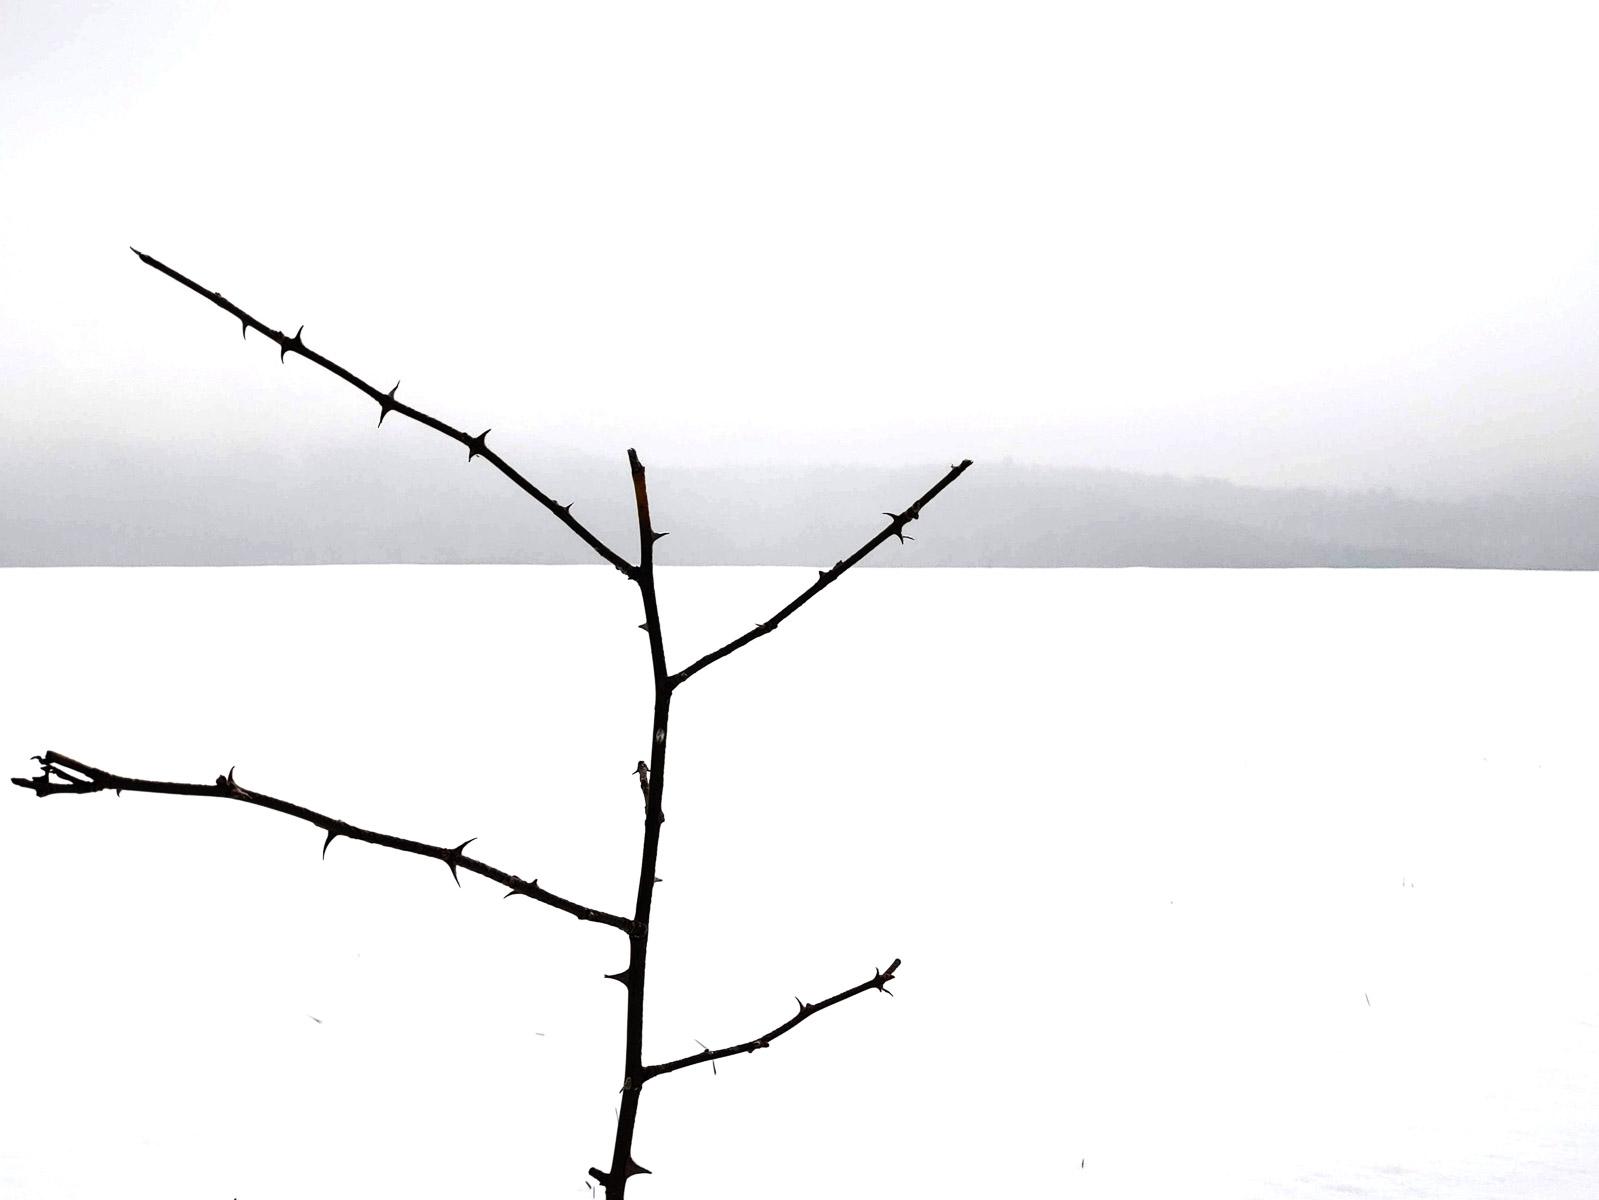 Dornen im Schnee (Foto: Peter Stollenmayer)